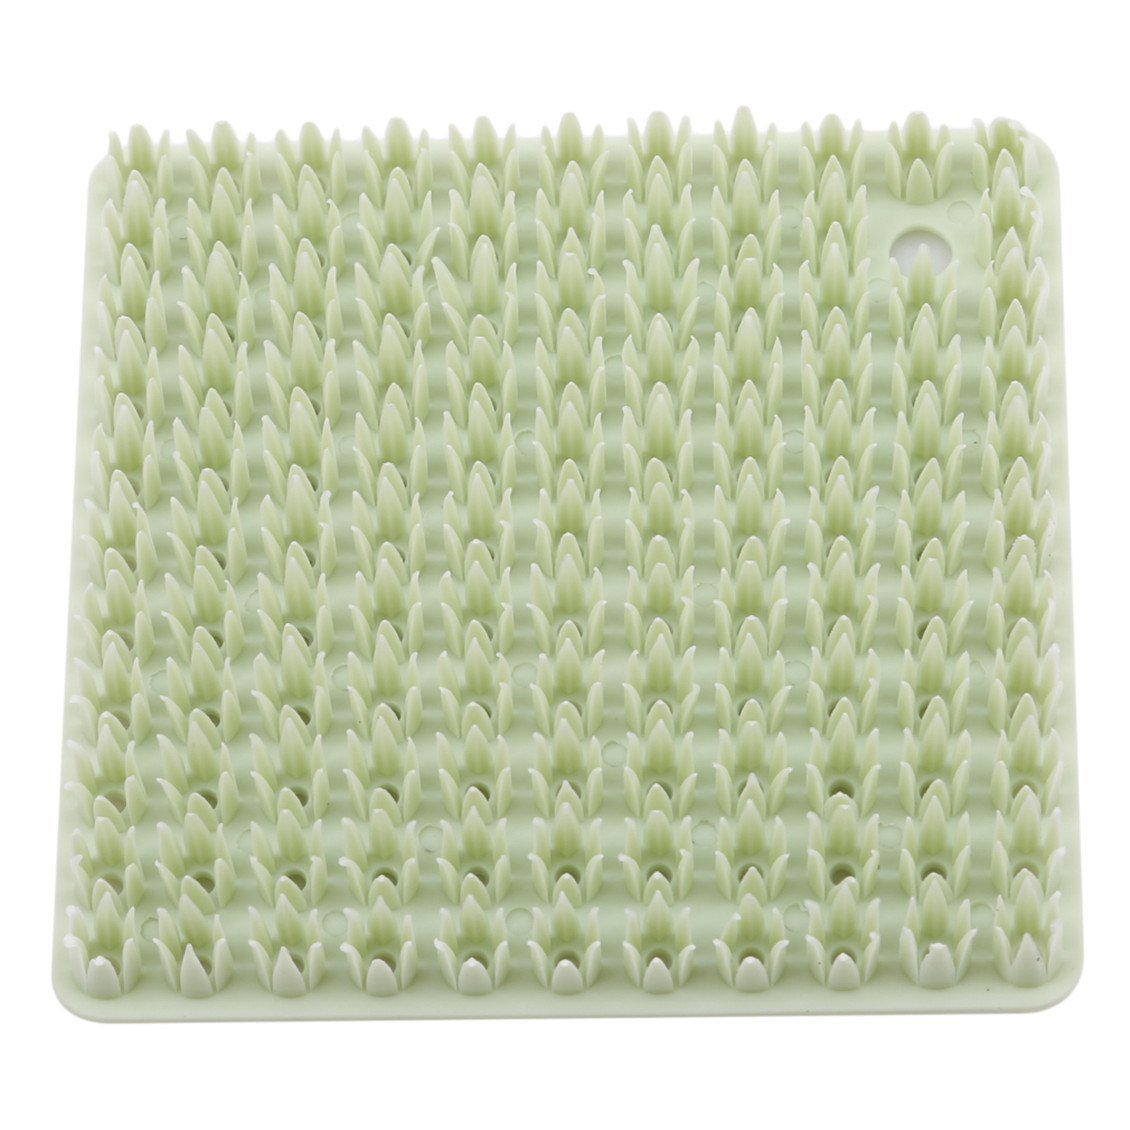 Dolland Silicone Washing Brush Silicone Dish Scrubber Kitchen Tool For Dishwashing,Green